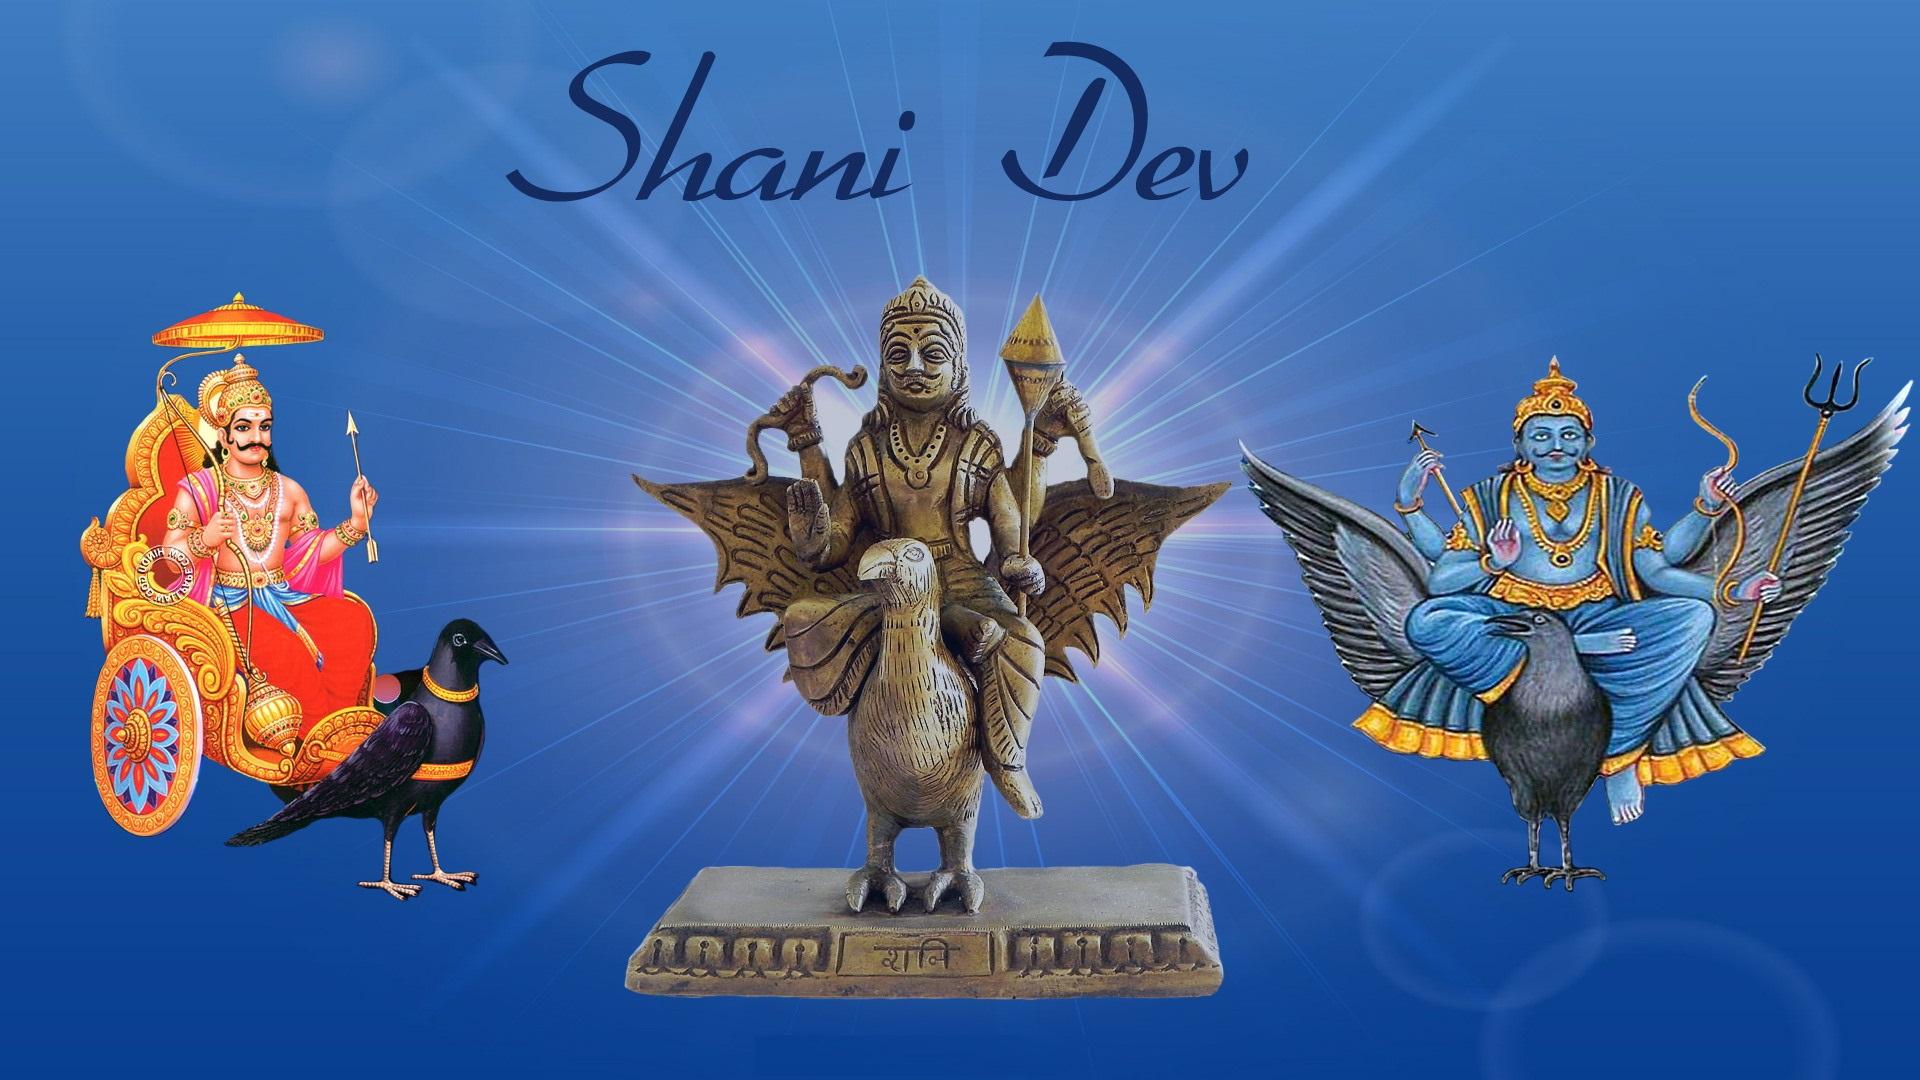 Shani dev HD Wallapaper